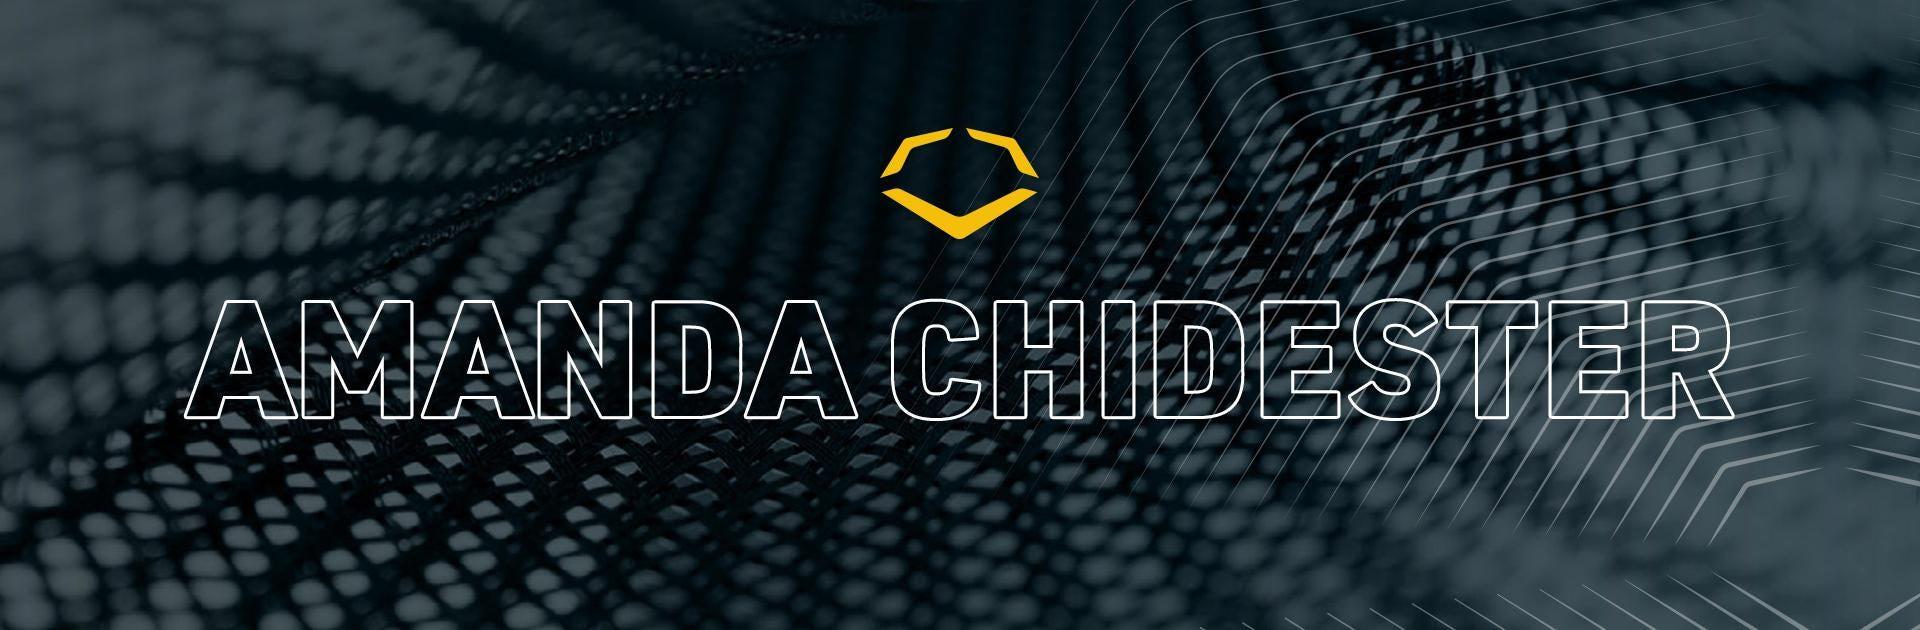 Amanda-Chidester-EvoShield-Catcher's-Gear